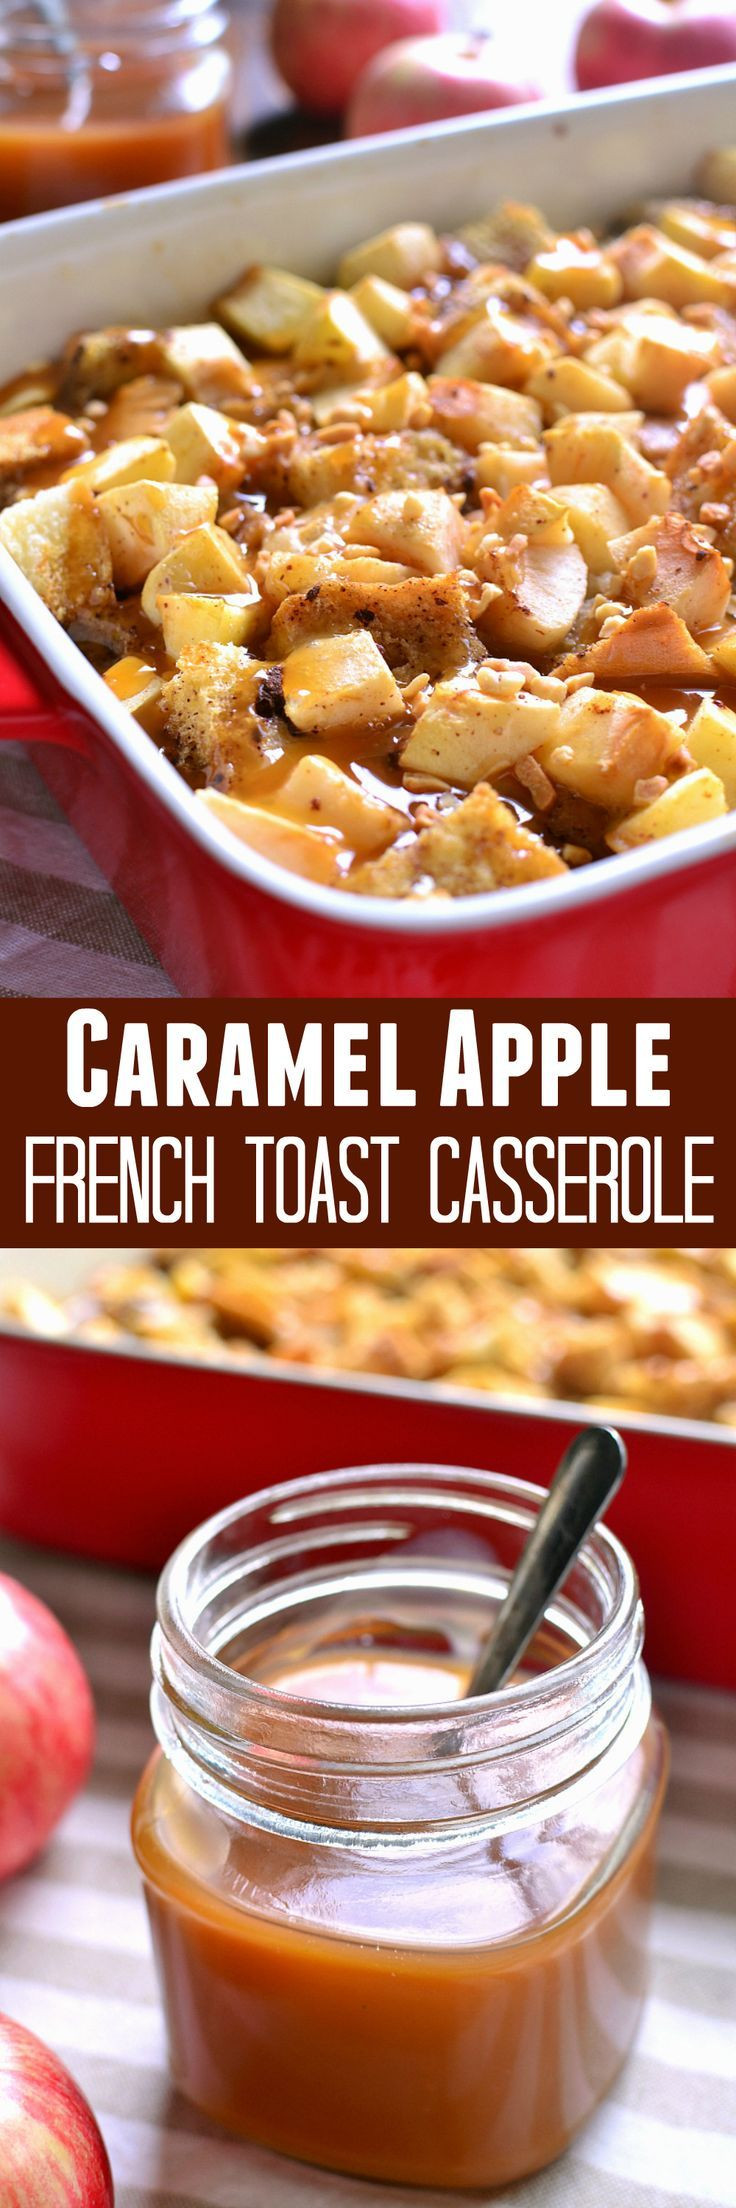 Fall Breakfast Recipes  Caramel Apple French Toast Casserole Recipe